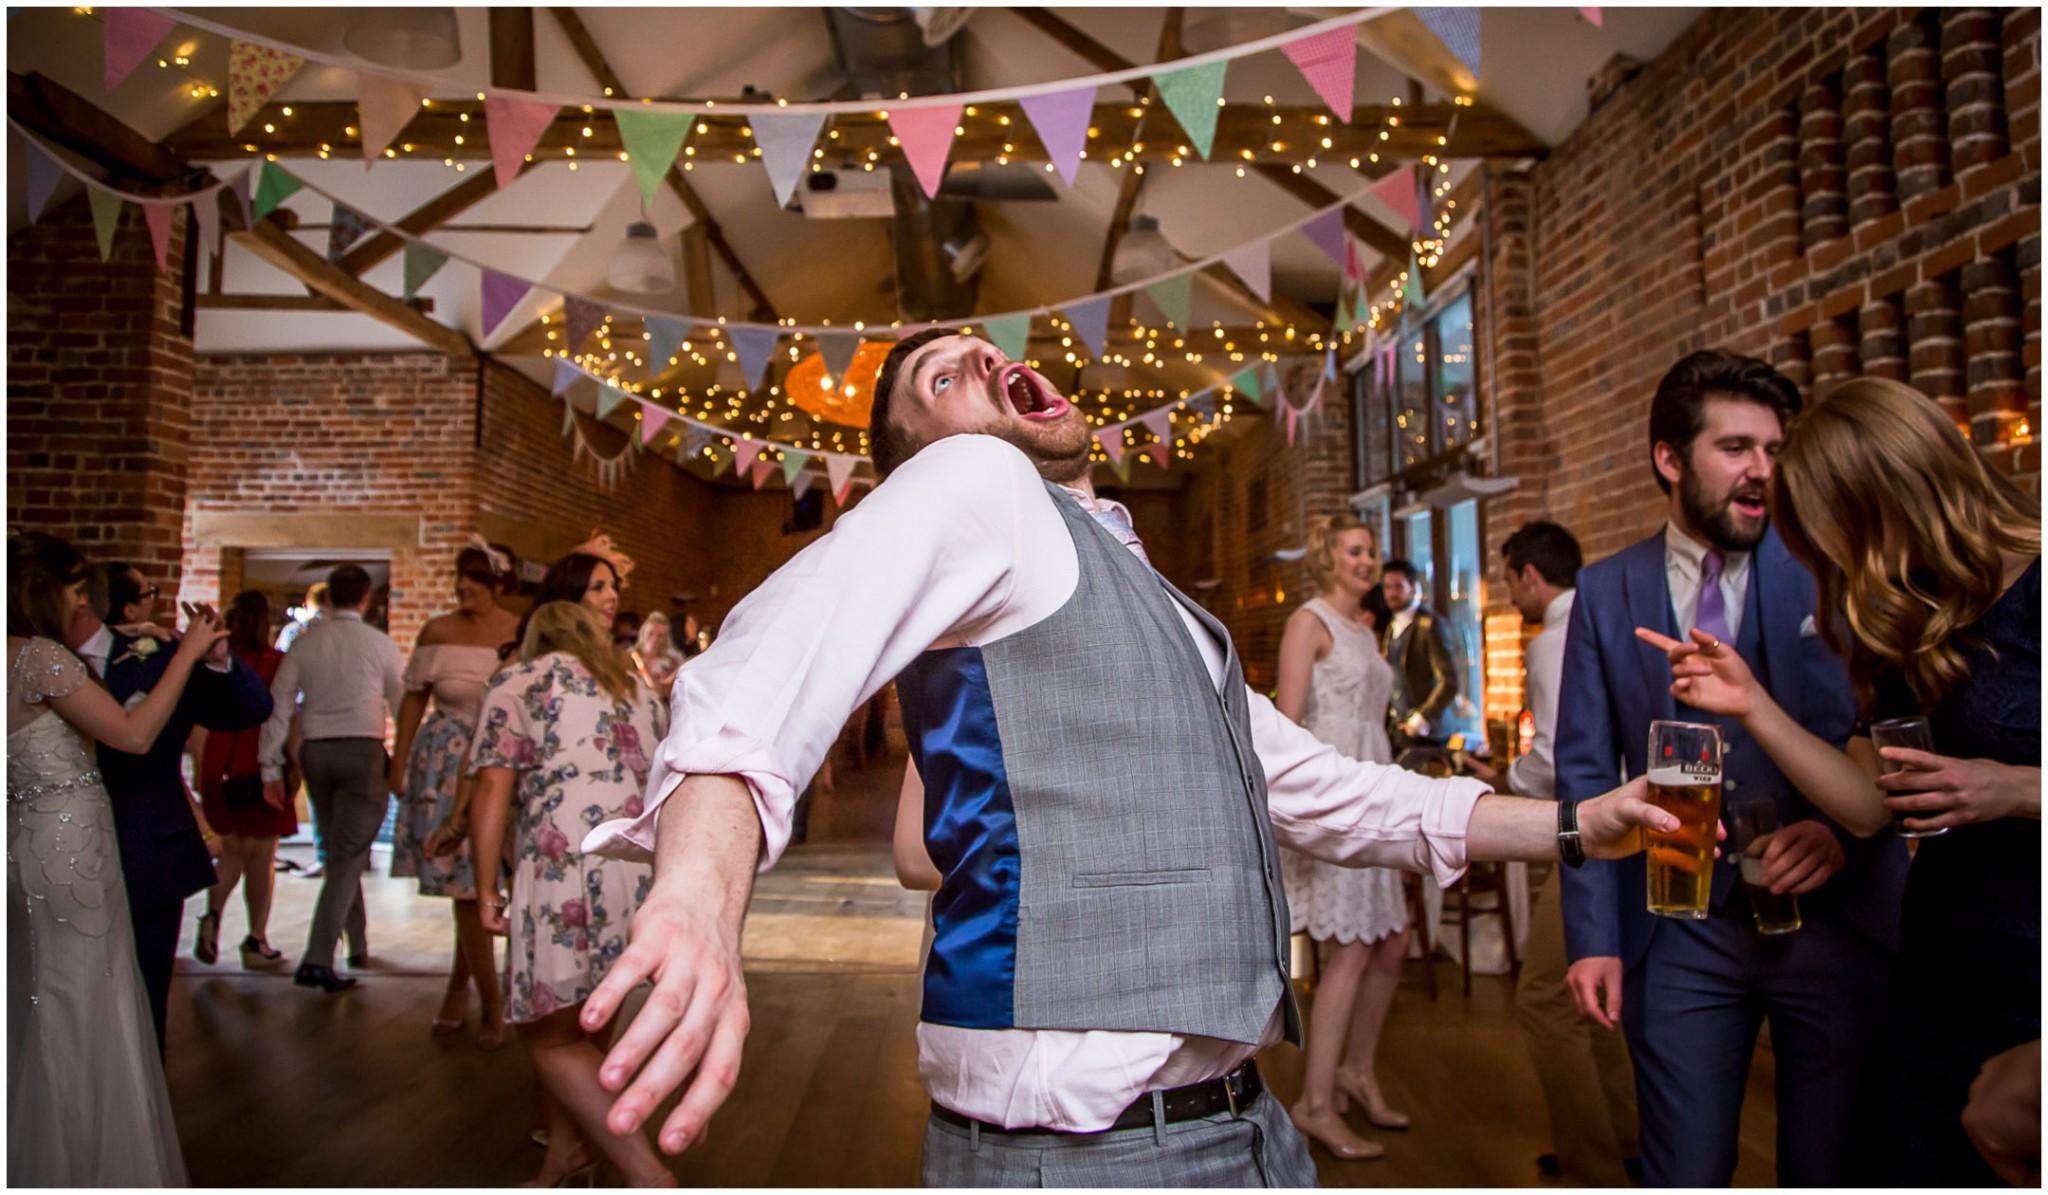 Wasing Park Wedding Photography evening wedding reception guest dancing